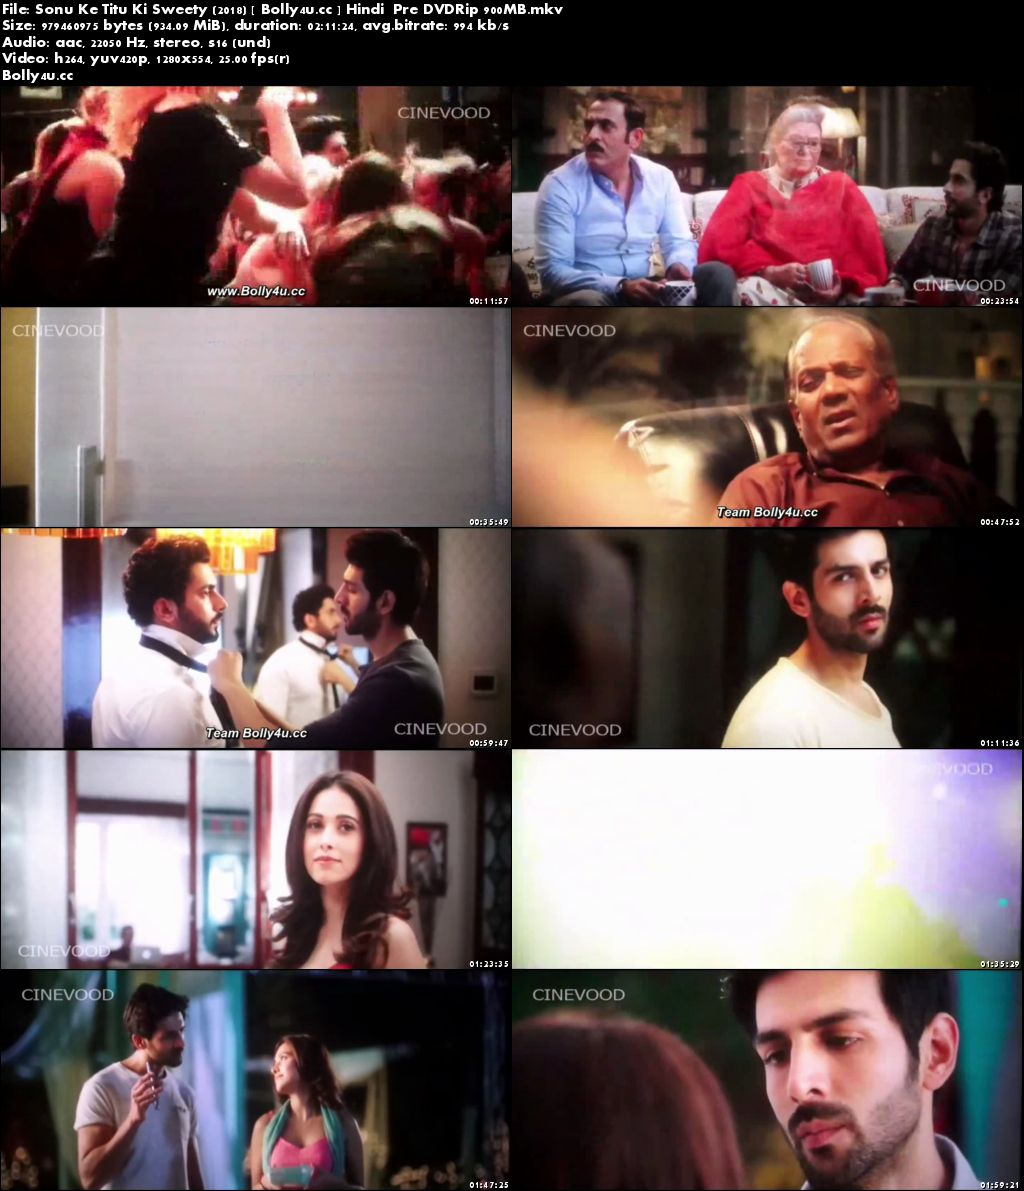 Sonu Ke Titu Ki Sweety 2018 pDVDRip 350MB Full Hindi Movie Download 480p